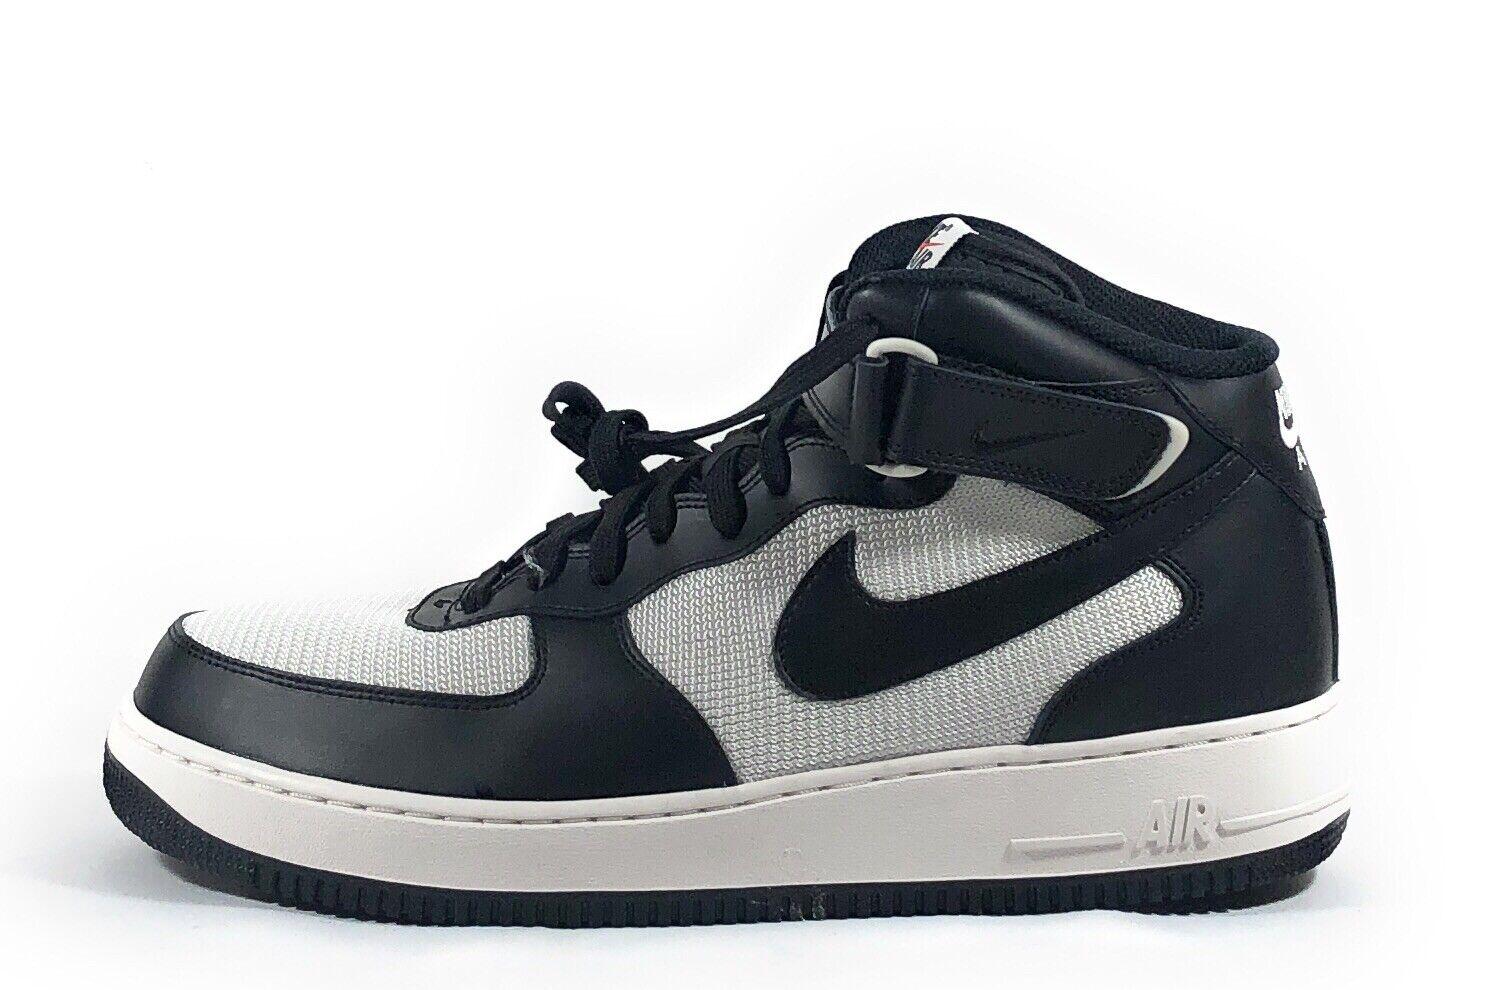 Nike Nike Nike Air Force 1 Uomo Mid Top nero bianca Basketball scarpe da ginnastica 315123-037 Sz 13 251380